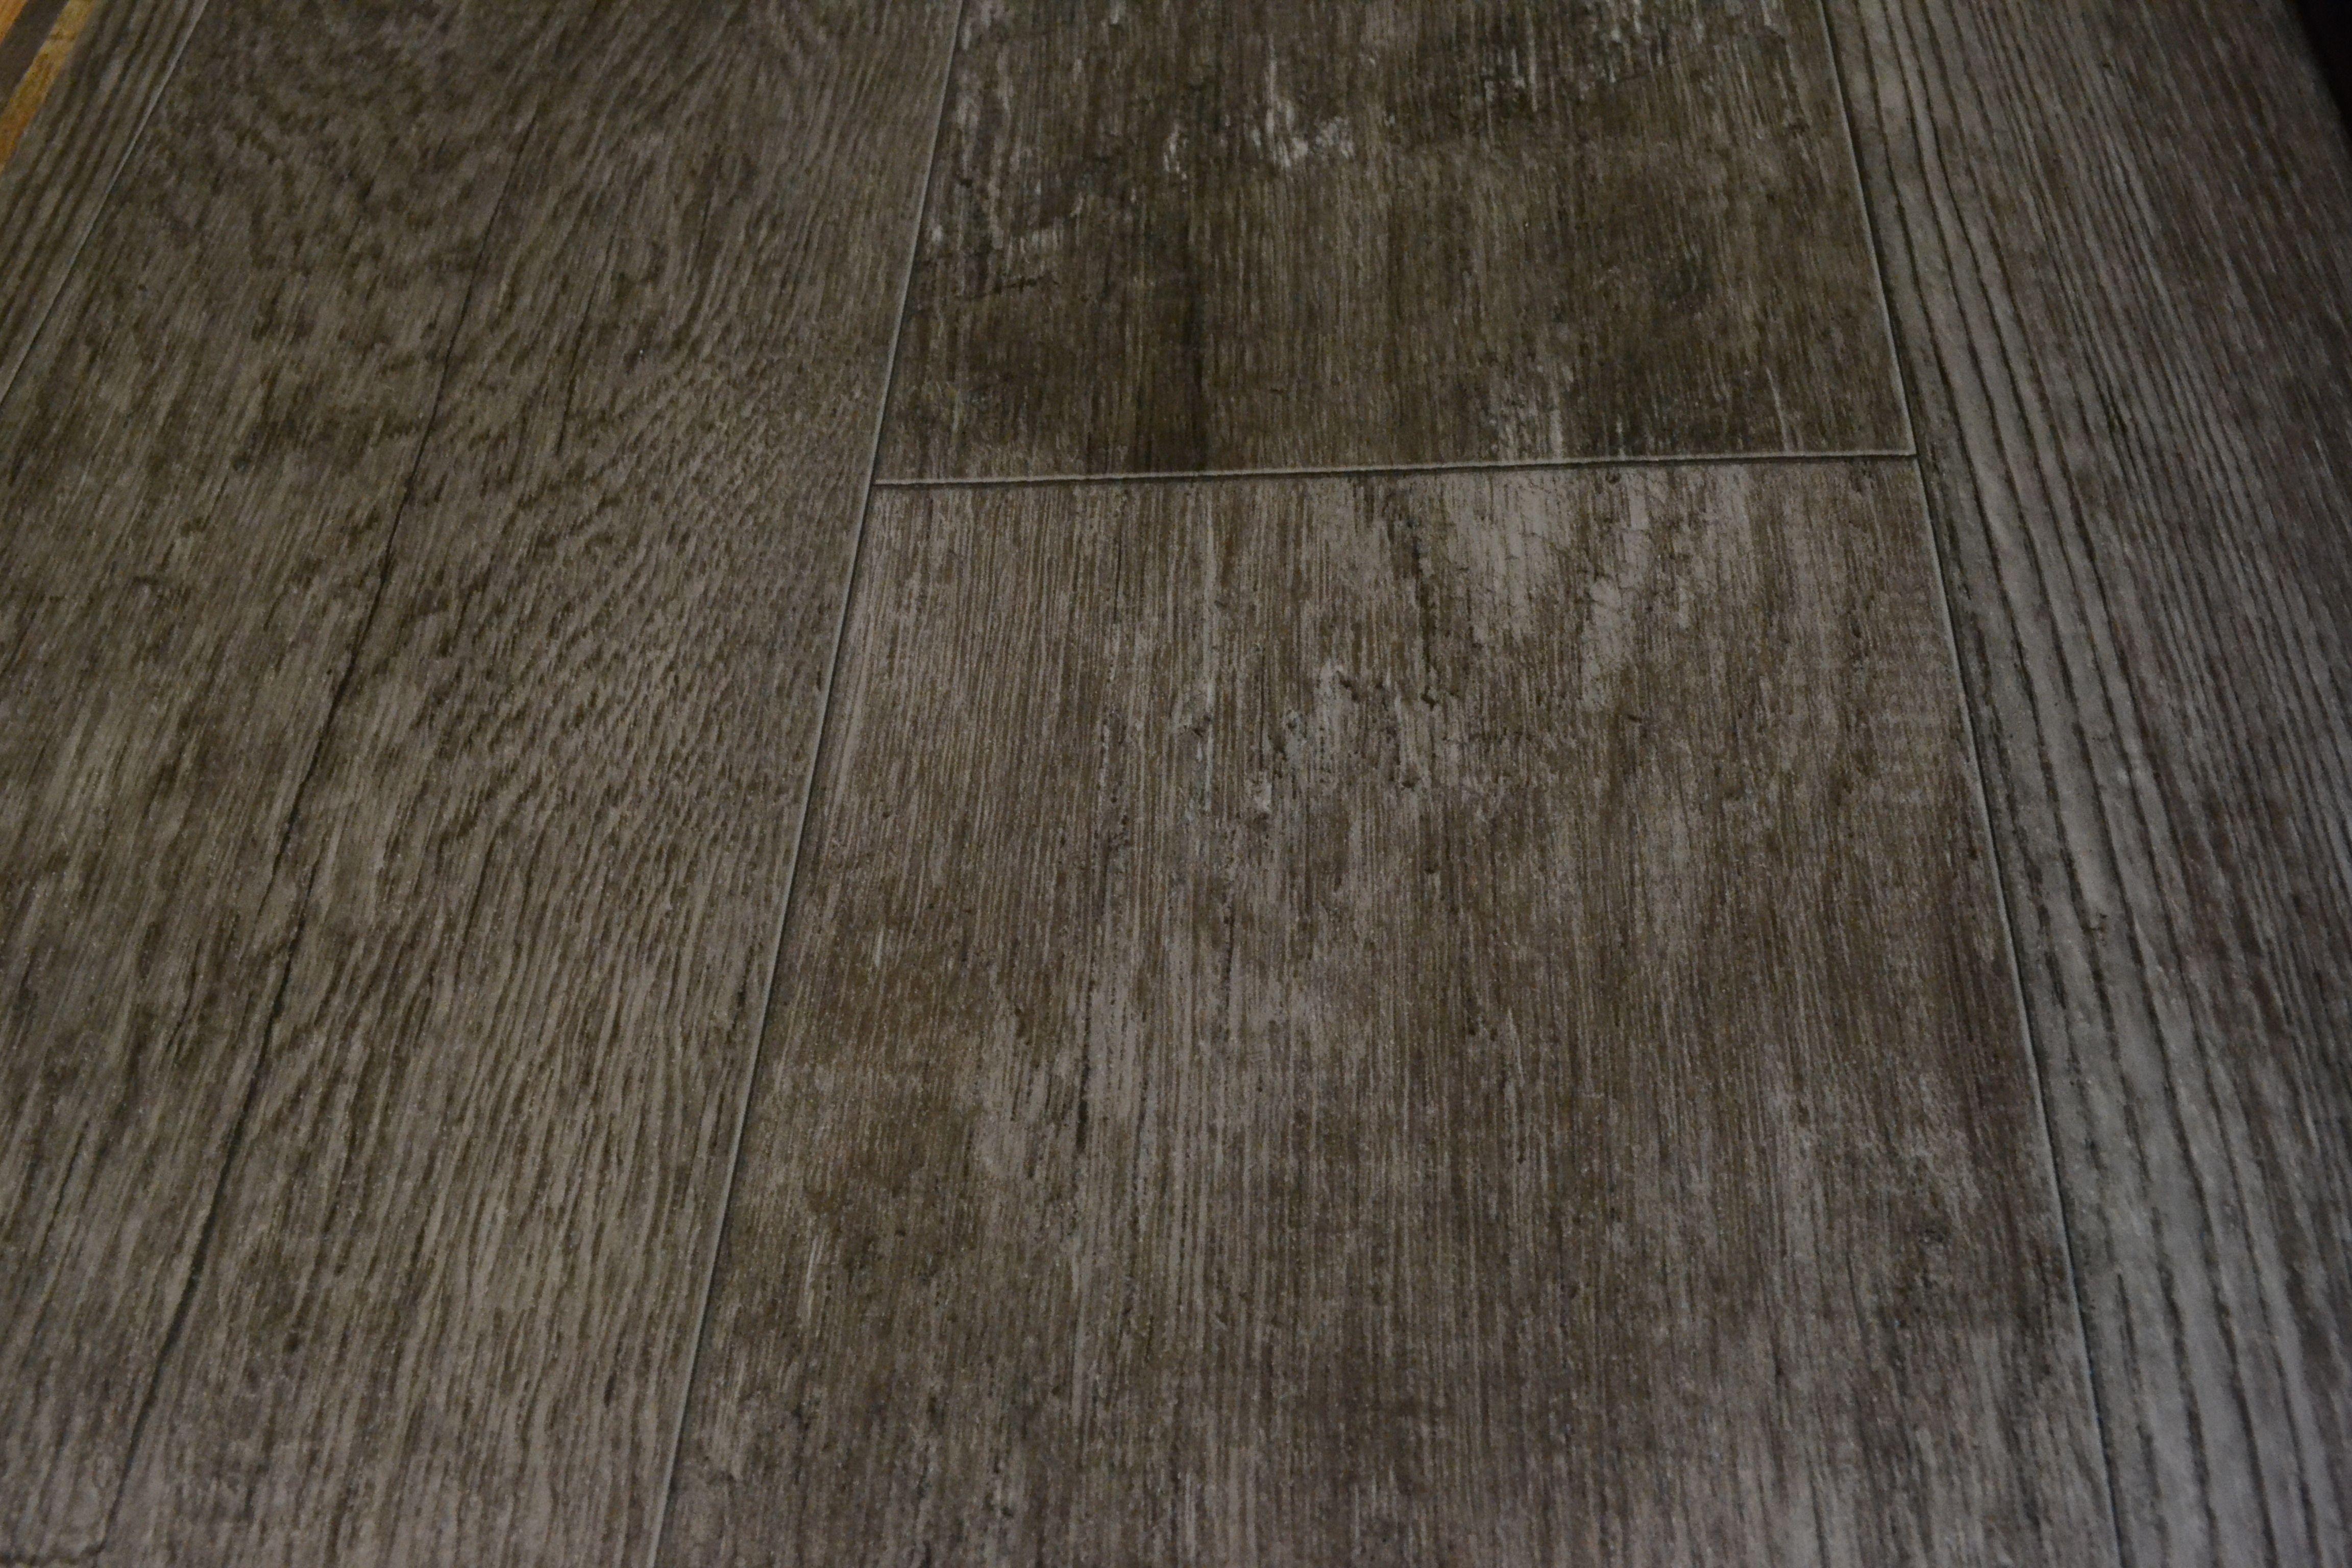 plank yoga studio flooring luxury sheet hardwood hot floors laminate wood gallery vinyl commercial